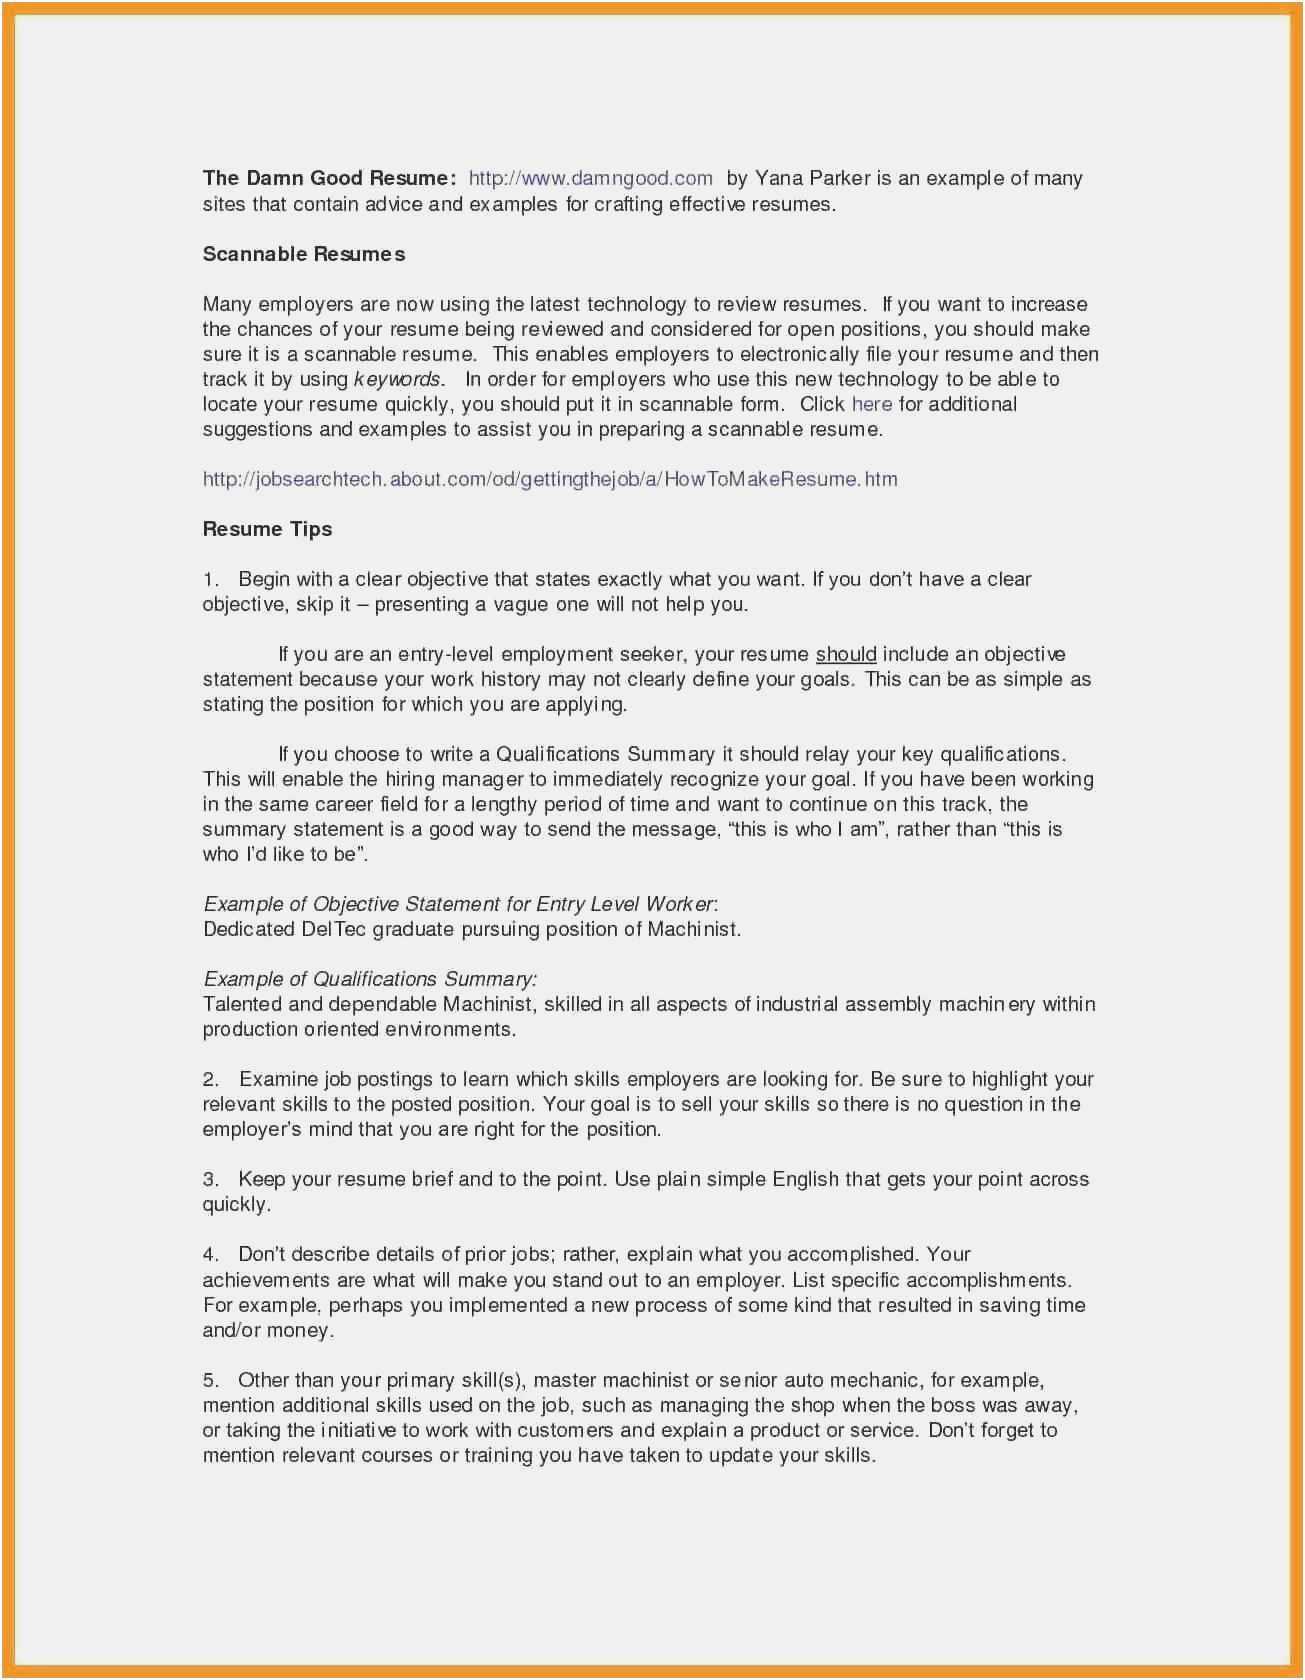 Resume For Graduate School Free Download Resume Summary Vs Cover Letter Inspirational Graduate School Resume New resume for graduate school|wikiresume.com